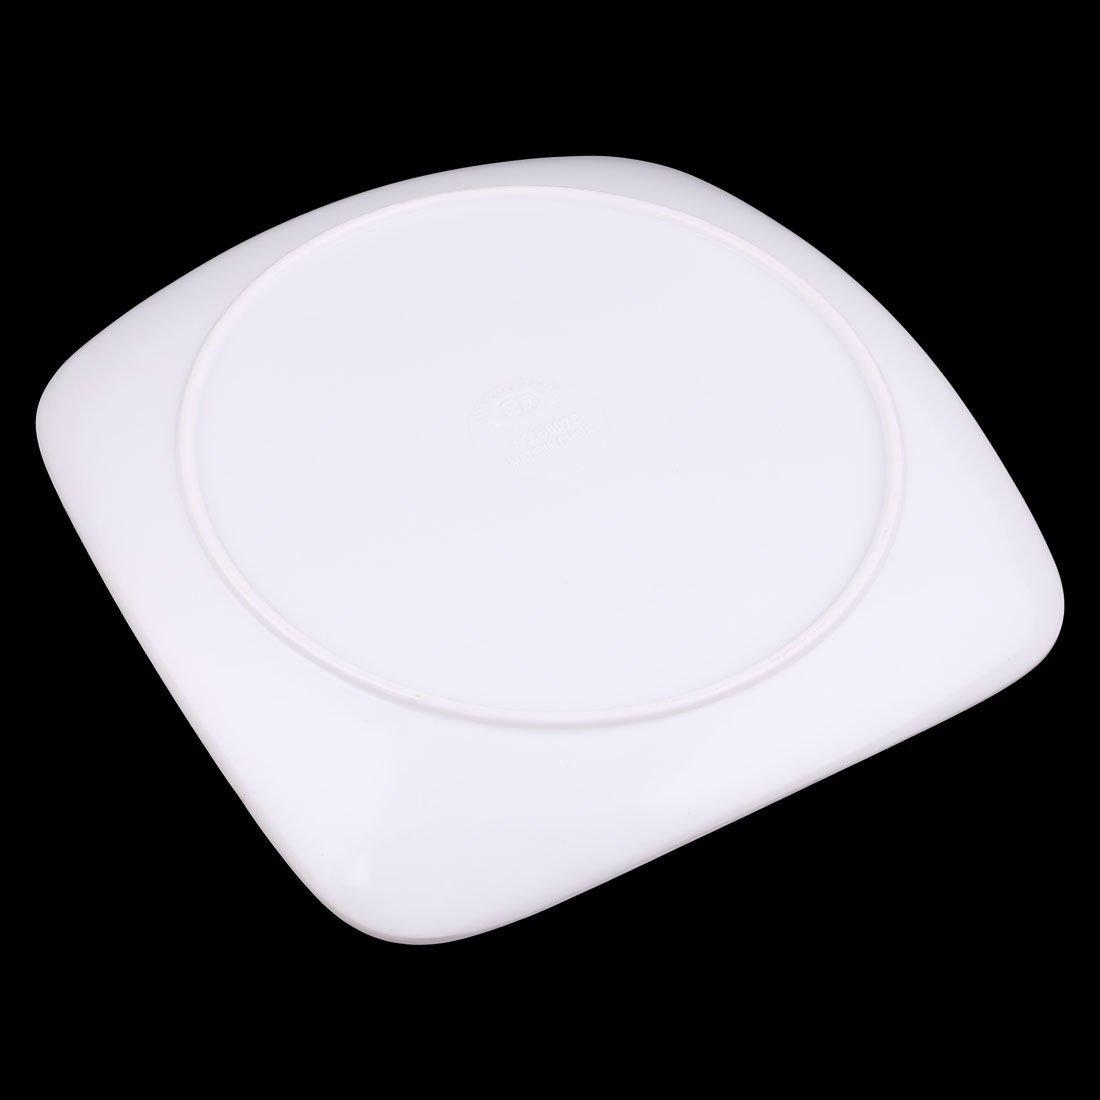 Amazon.com | DealMux melamina Home Kitchen Praça Flor Shaped Food Dessert Plate Bandeja Fuchsia: Accent Plates